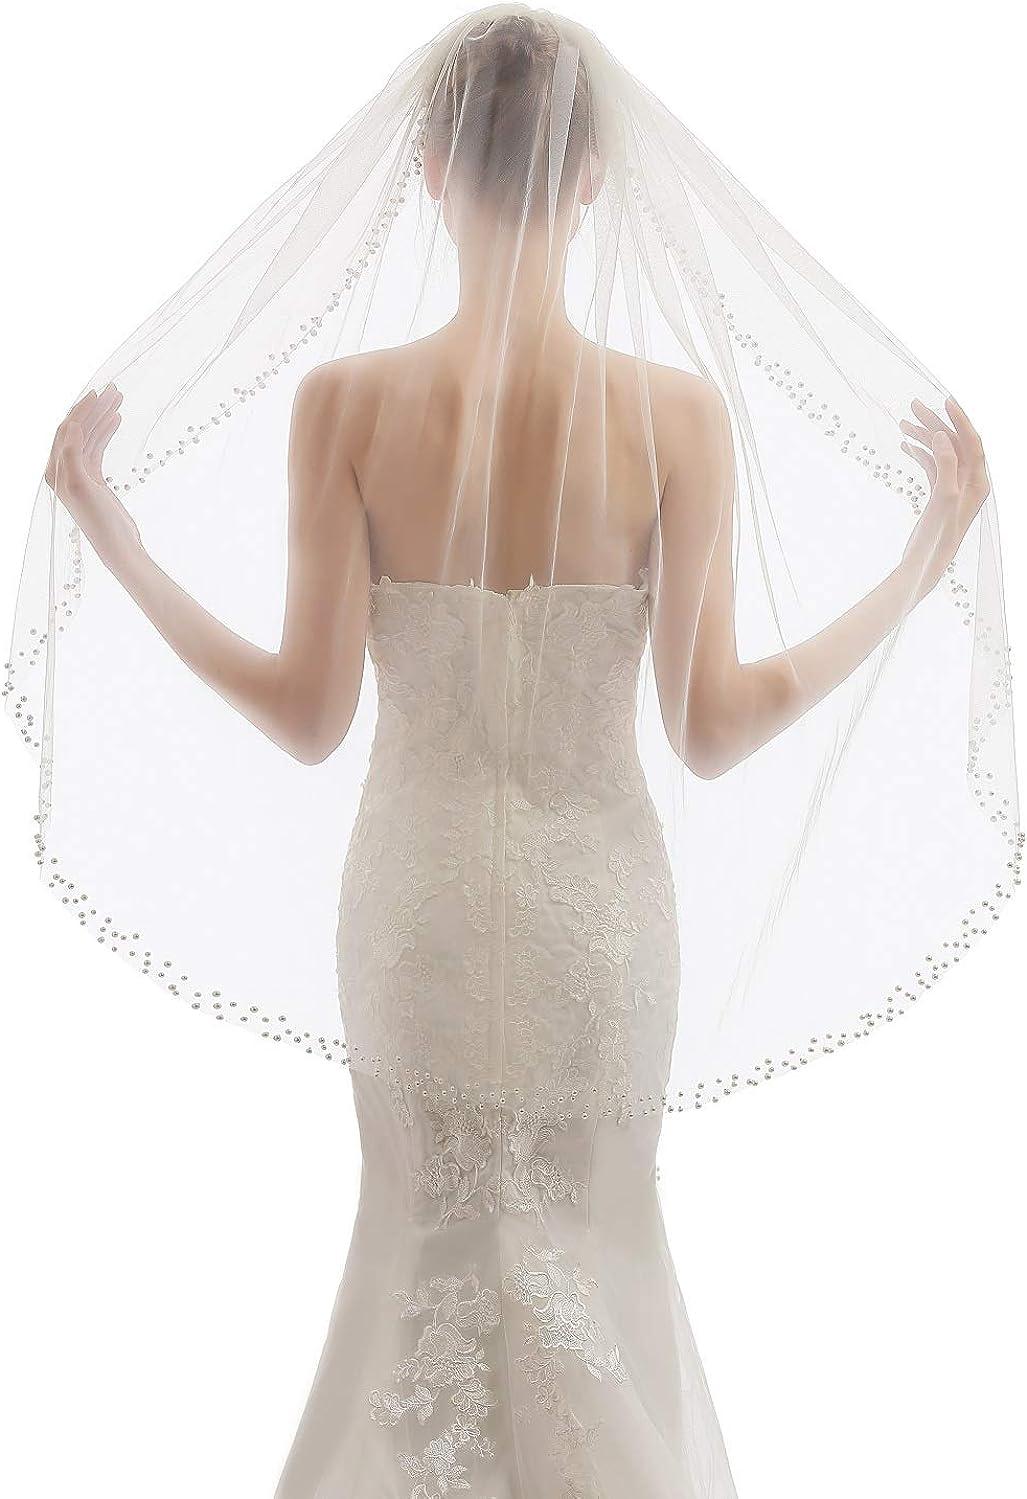 Elawbty Womens 1 Tier Fingertip Length Pearl Wedding Bridal Veil With Comb X01